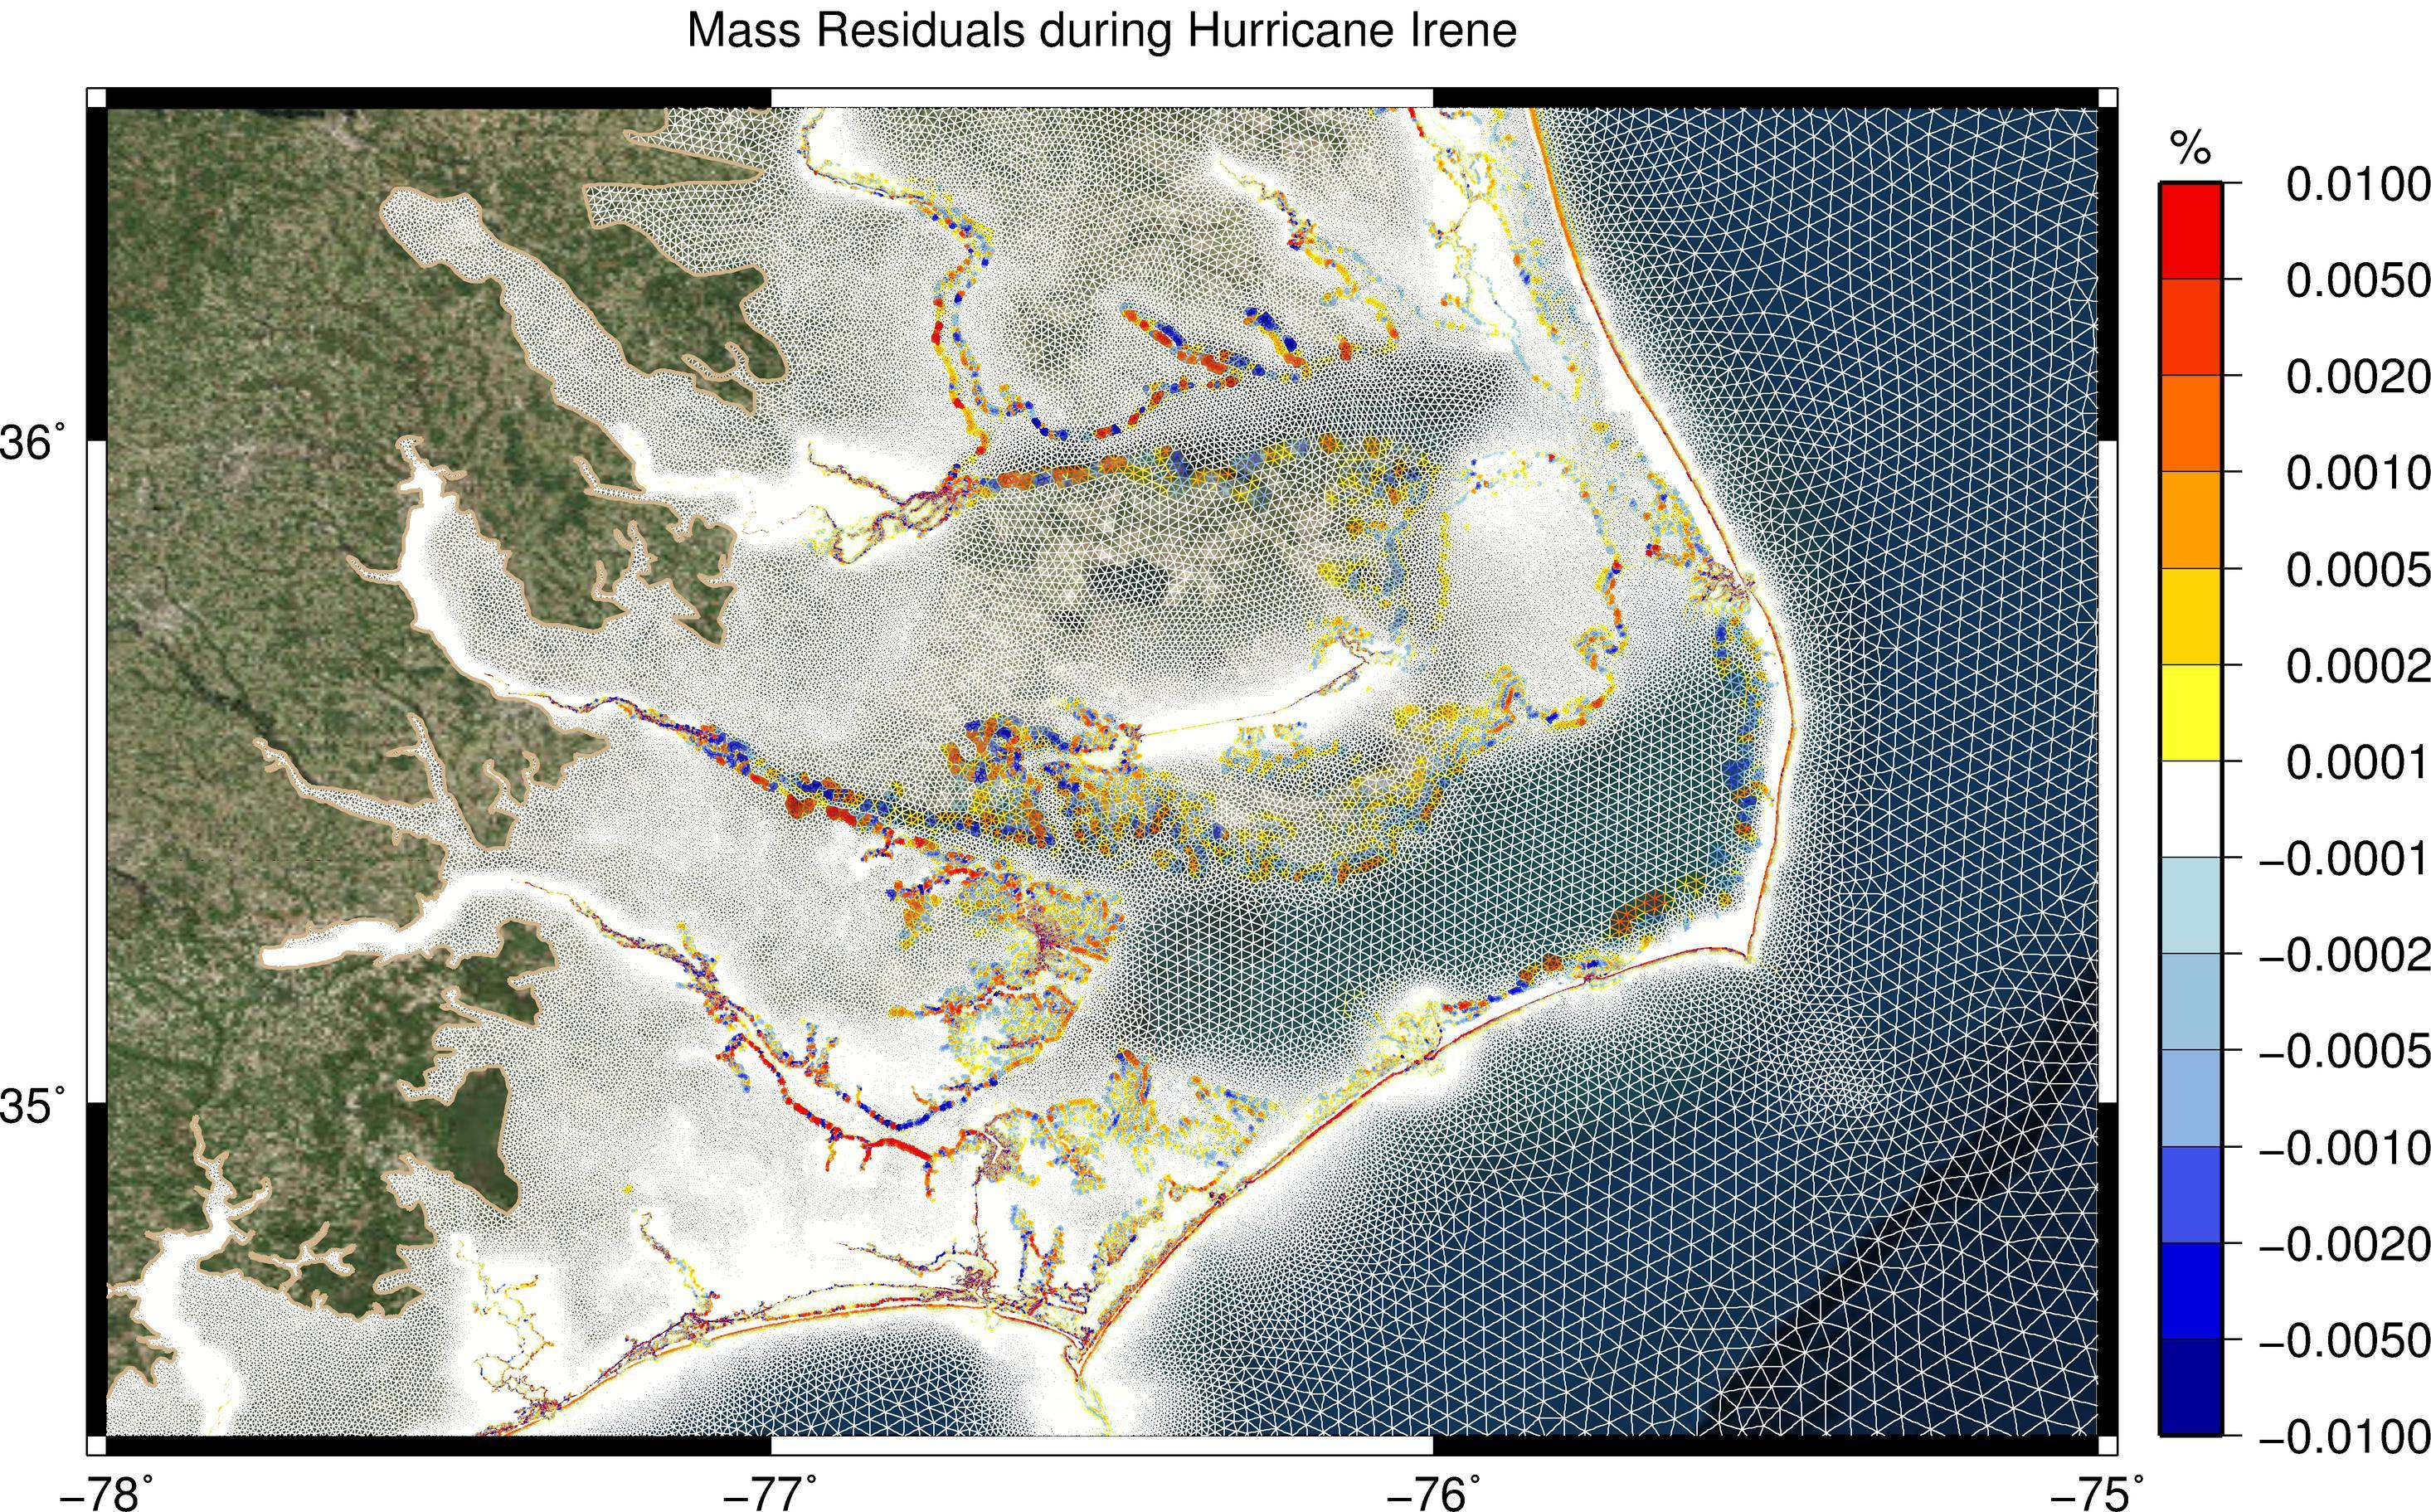 Mass residuals (as percentage of still-water volume) during Hurricane Irene (2011).